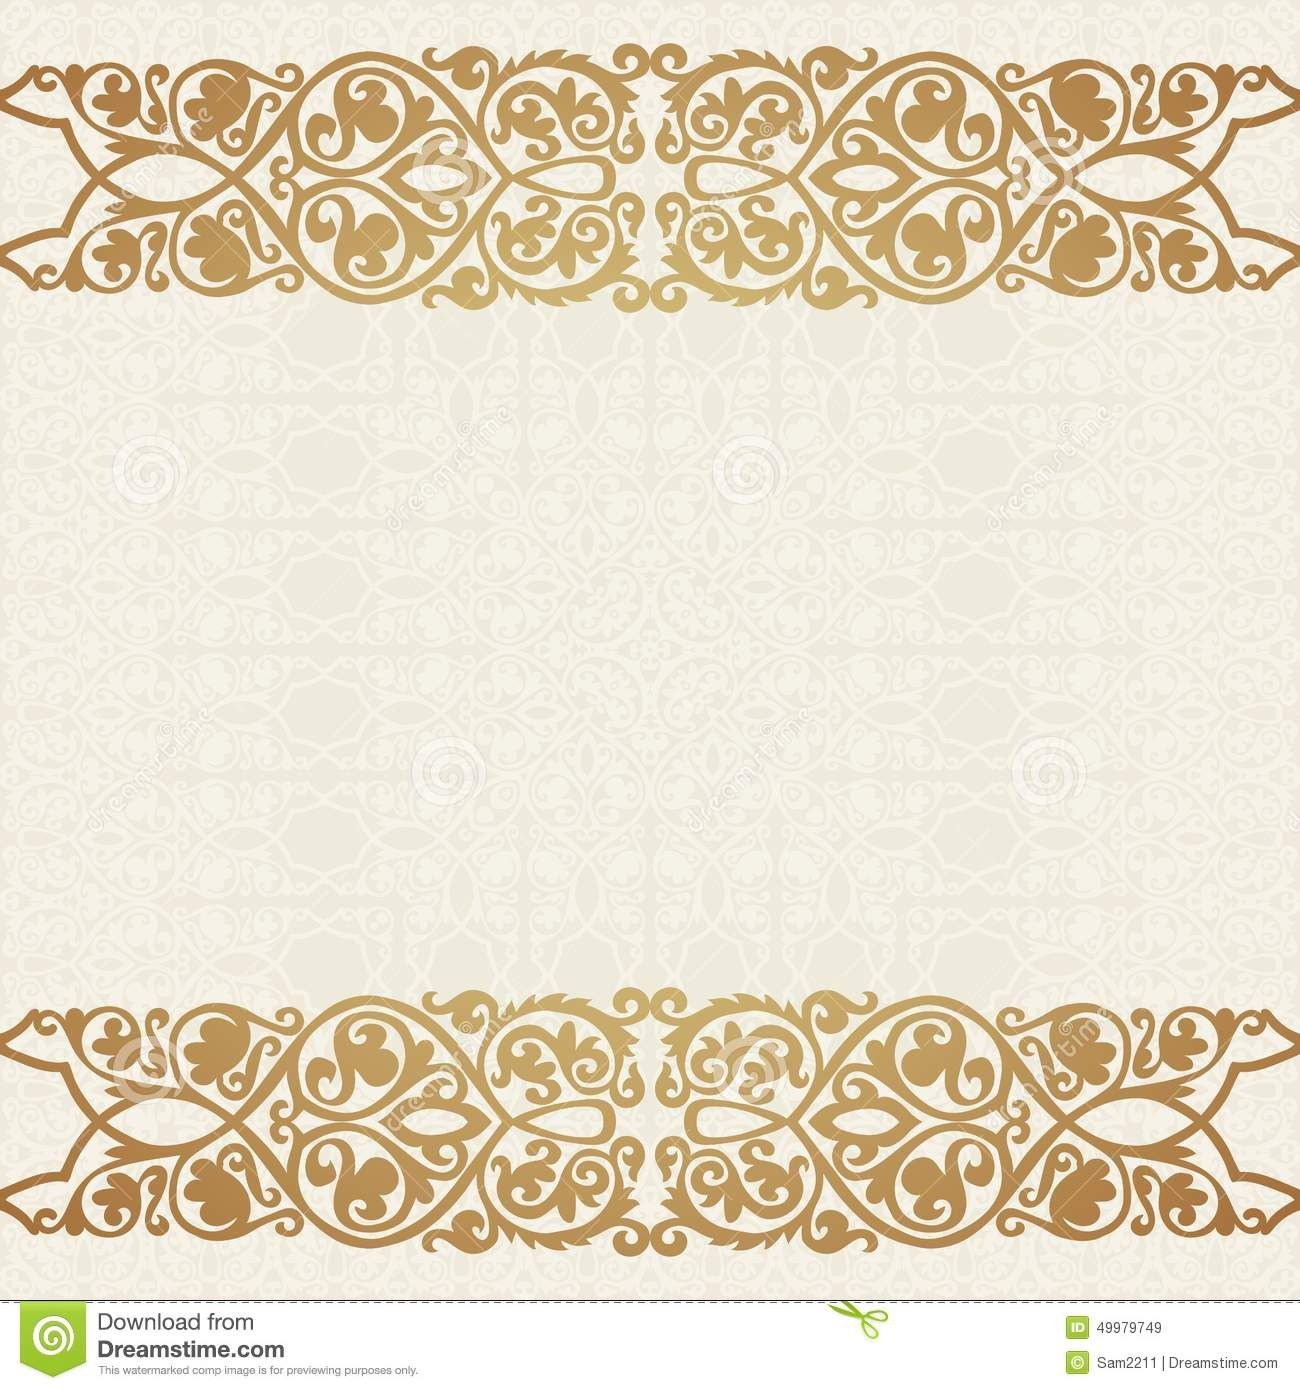 Luxury gold border seamless background save date card wedding luxury gold border seamless background save date card stopboris Image collections